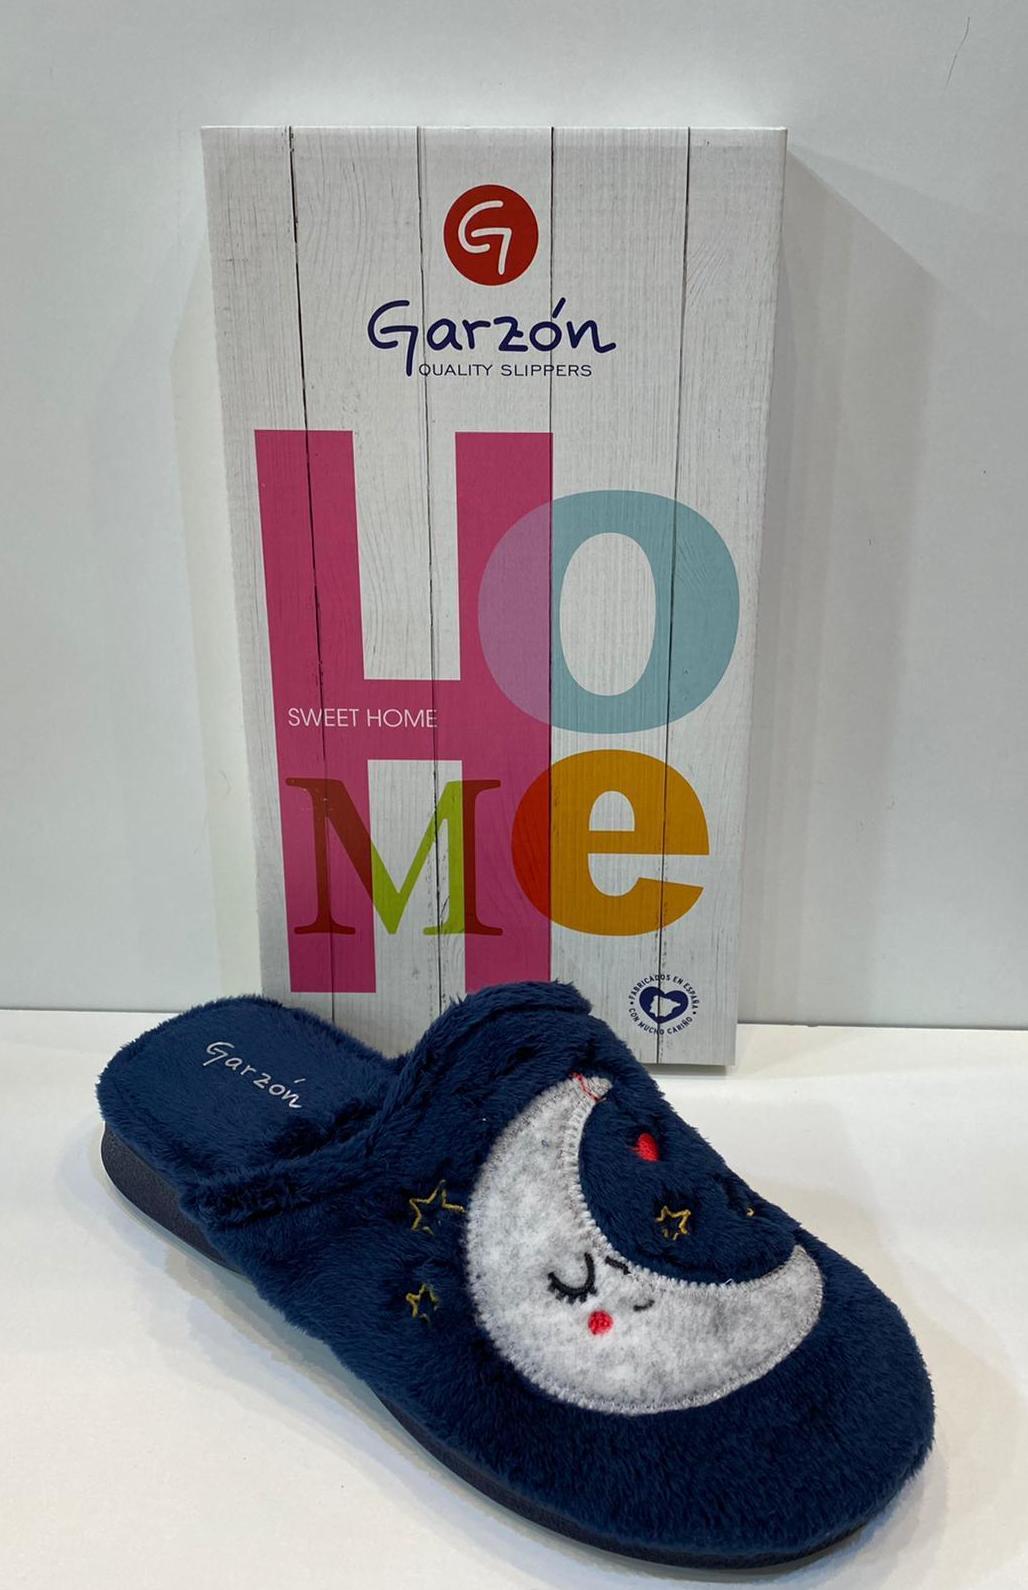 Espardenya de dona, de la marca Garzón, amb sola de goma antilliscant 29.50€